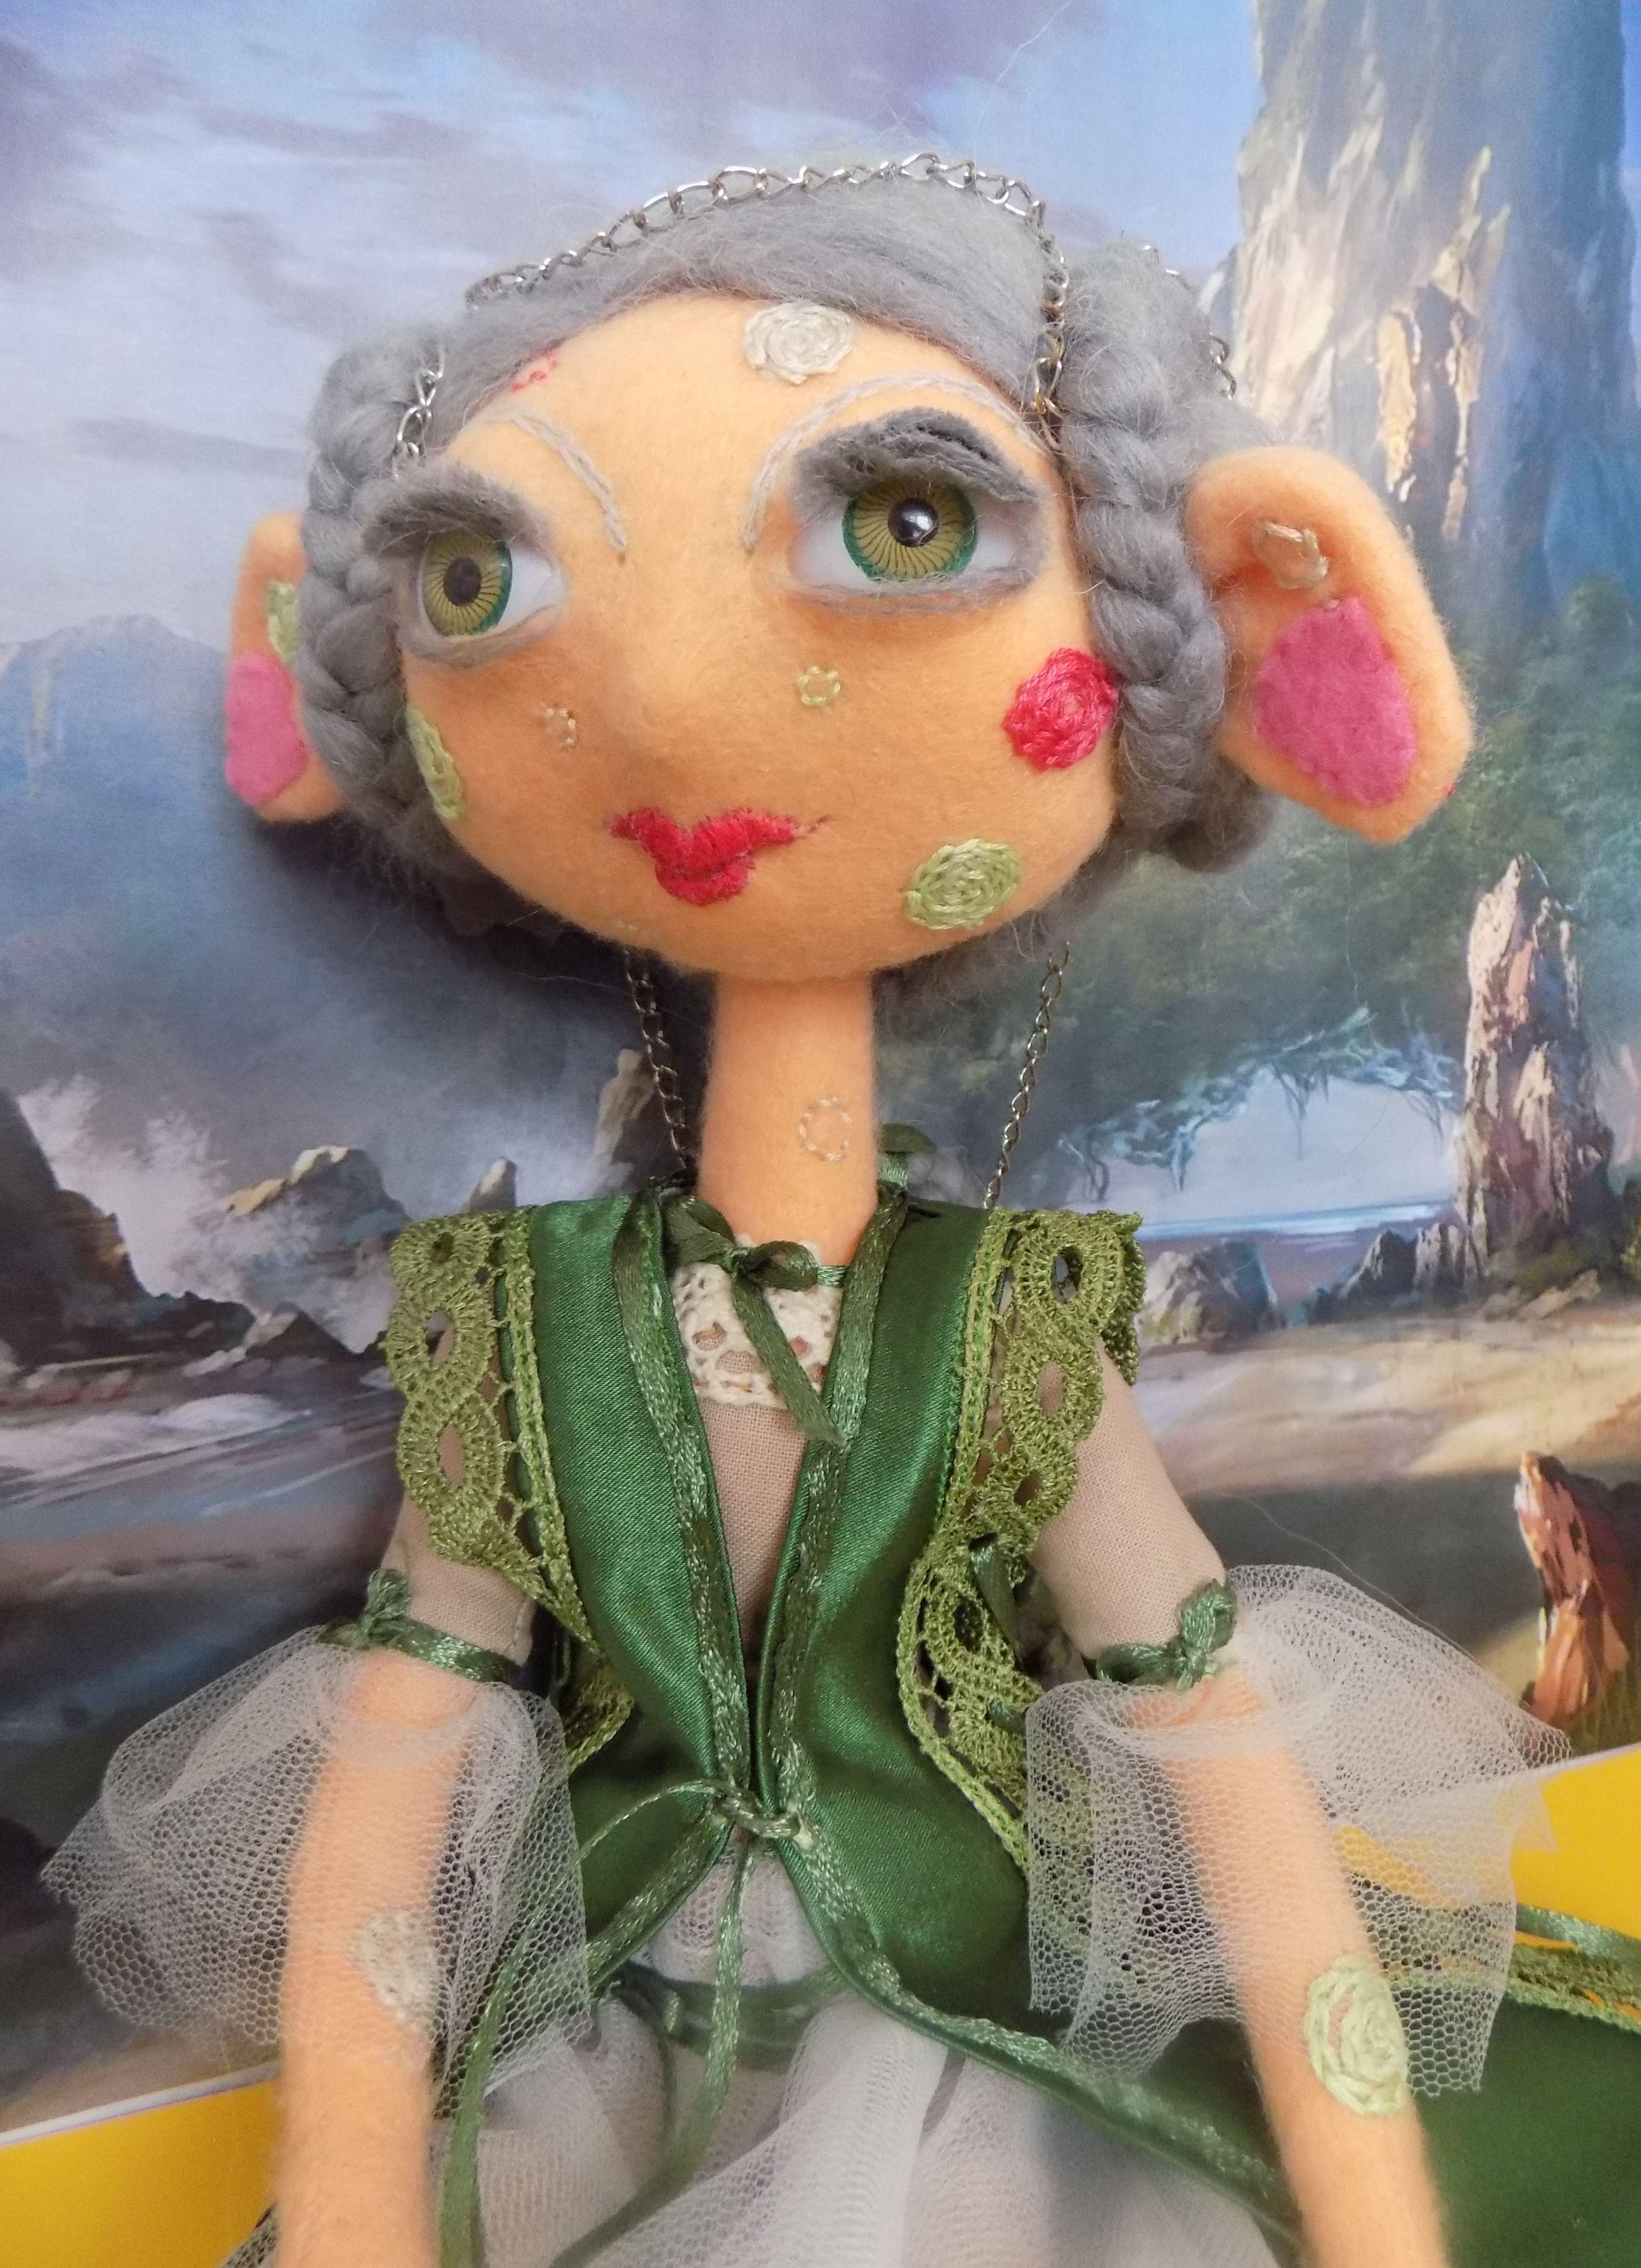 авторская интерьерная фэнтези ручная сказка будуарная необычная кукла фетр